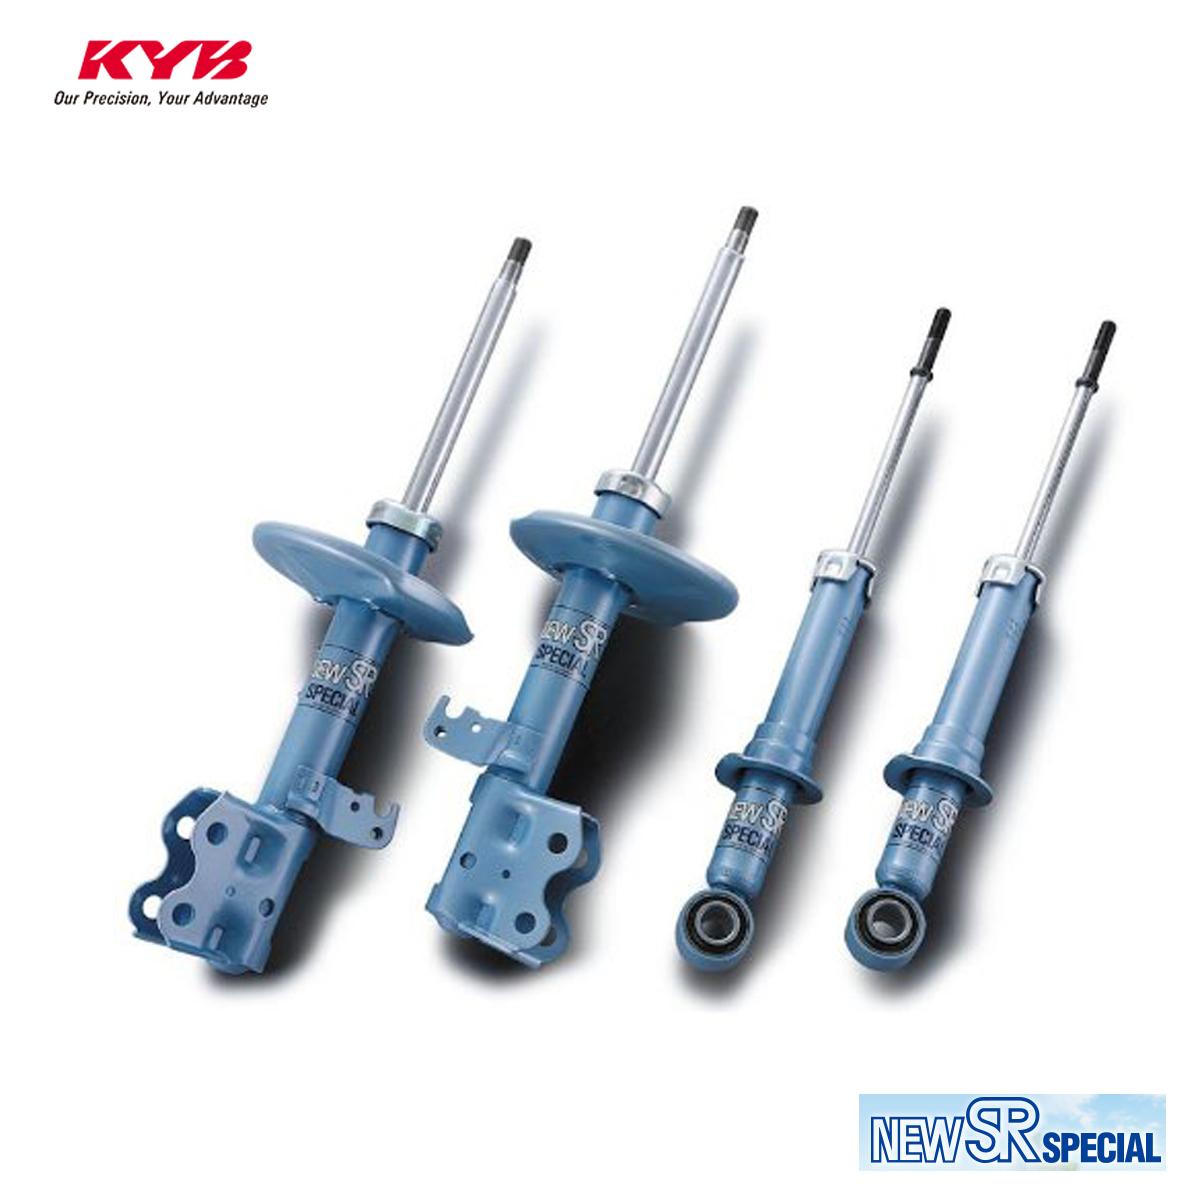 KYB カヤバ セプター SXV15 ショックアブソーバー リア左用 1本 NEW SR SPECIAL NST5164L 配送先条件有り